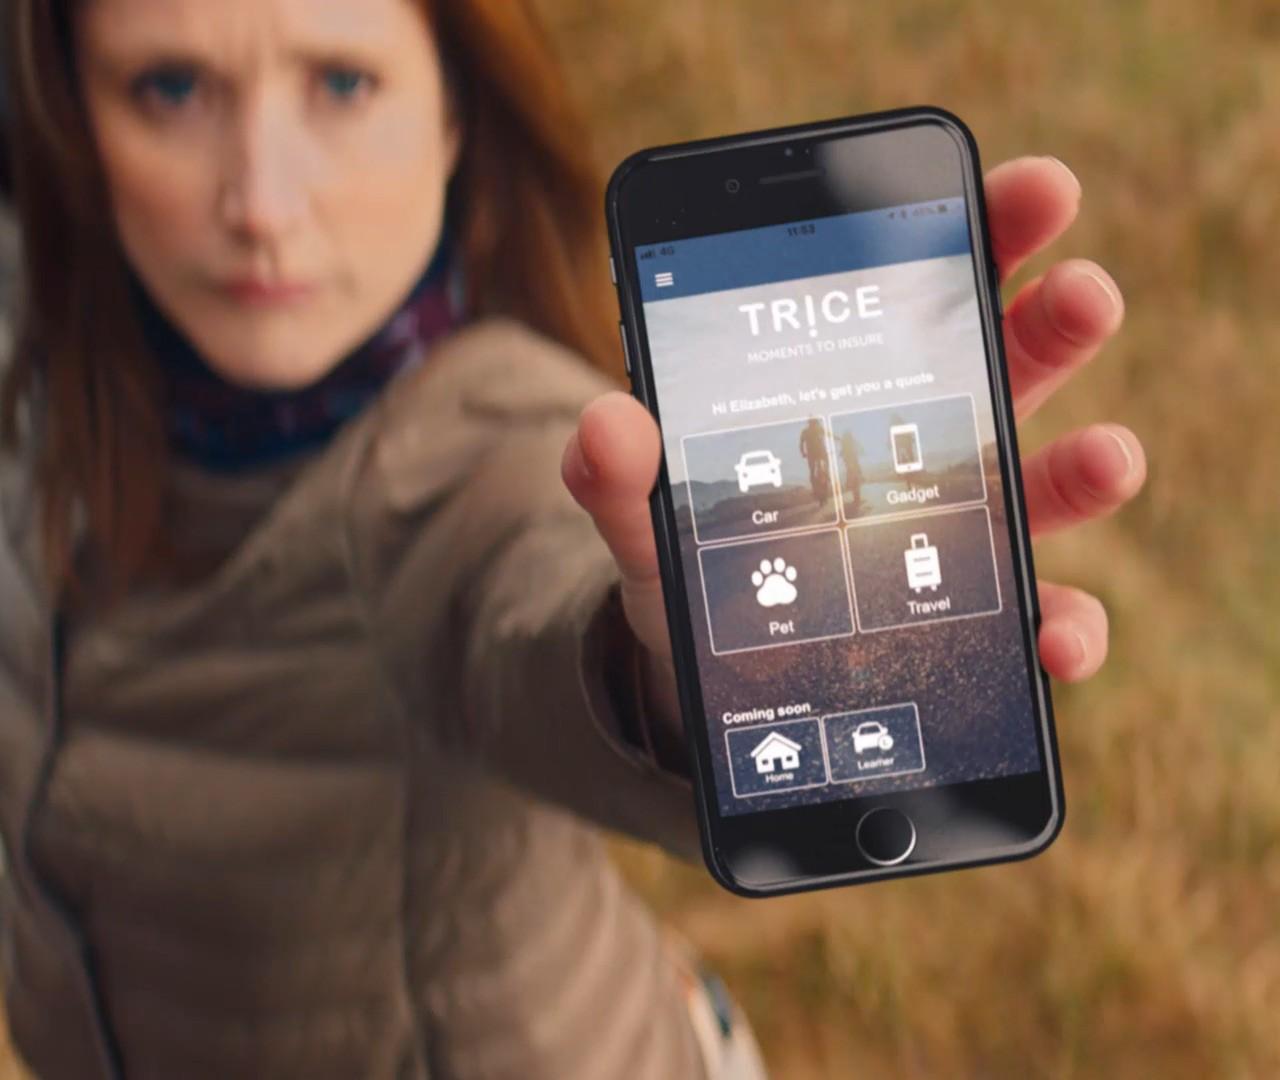 Trice Insurance TV Advert